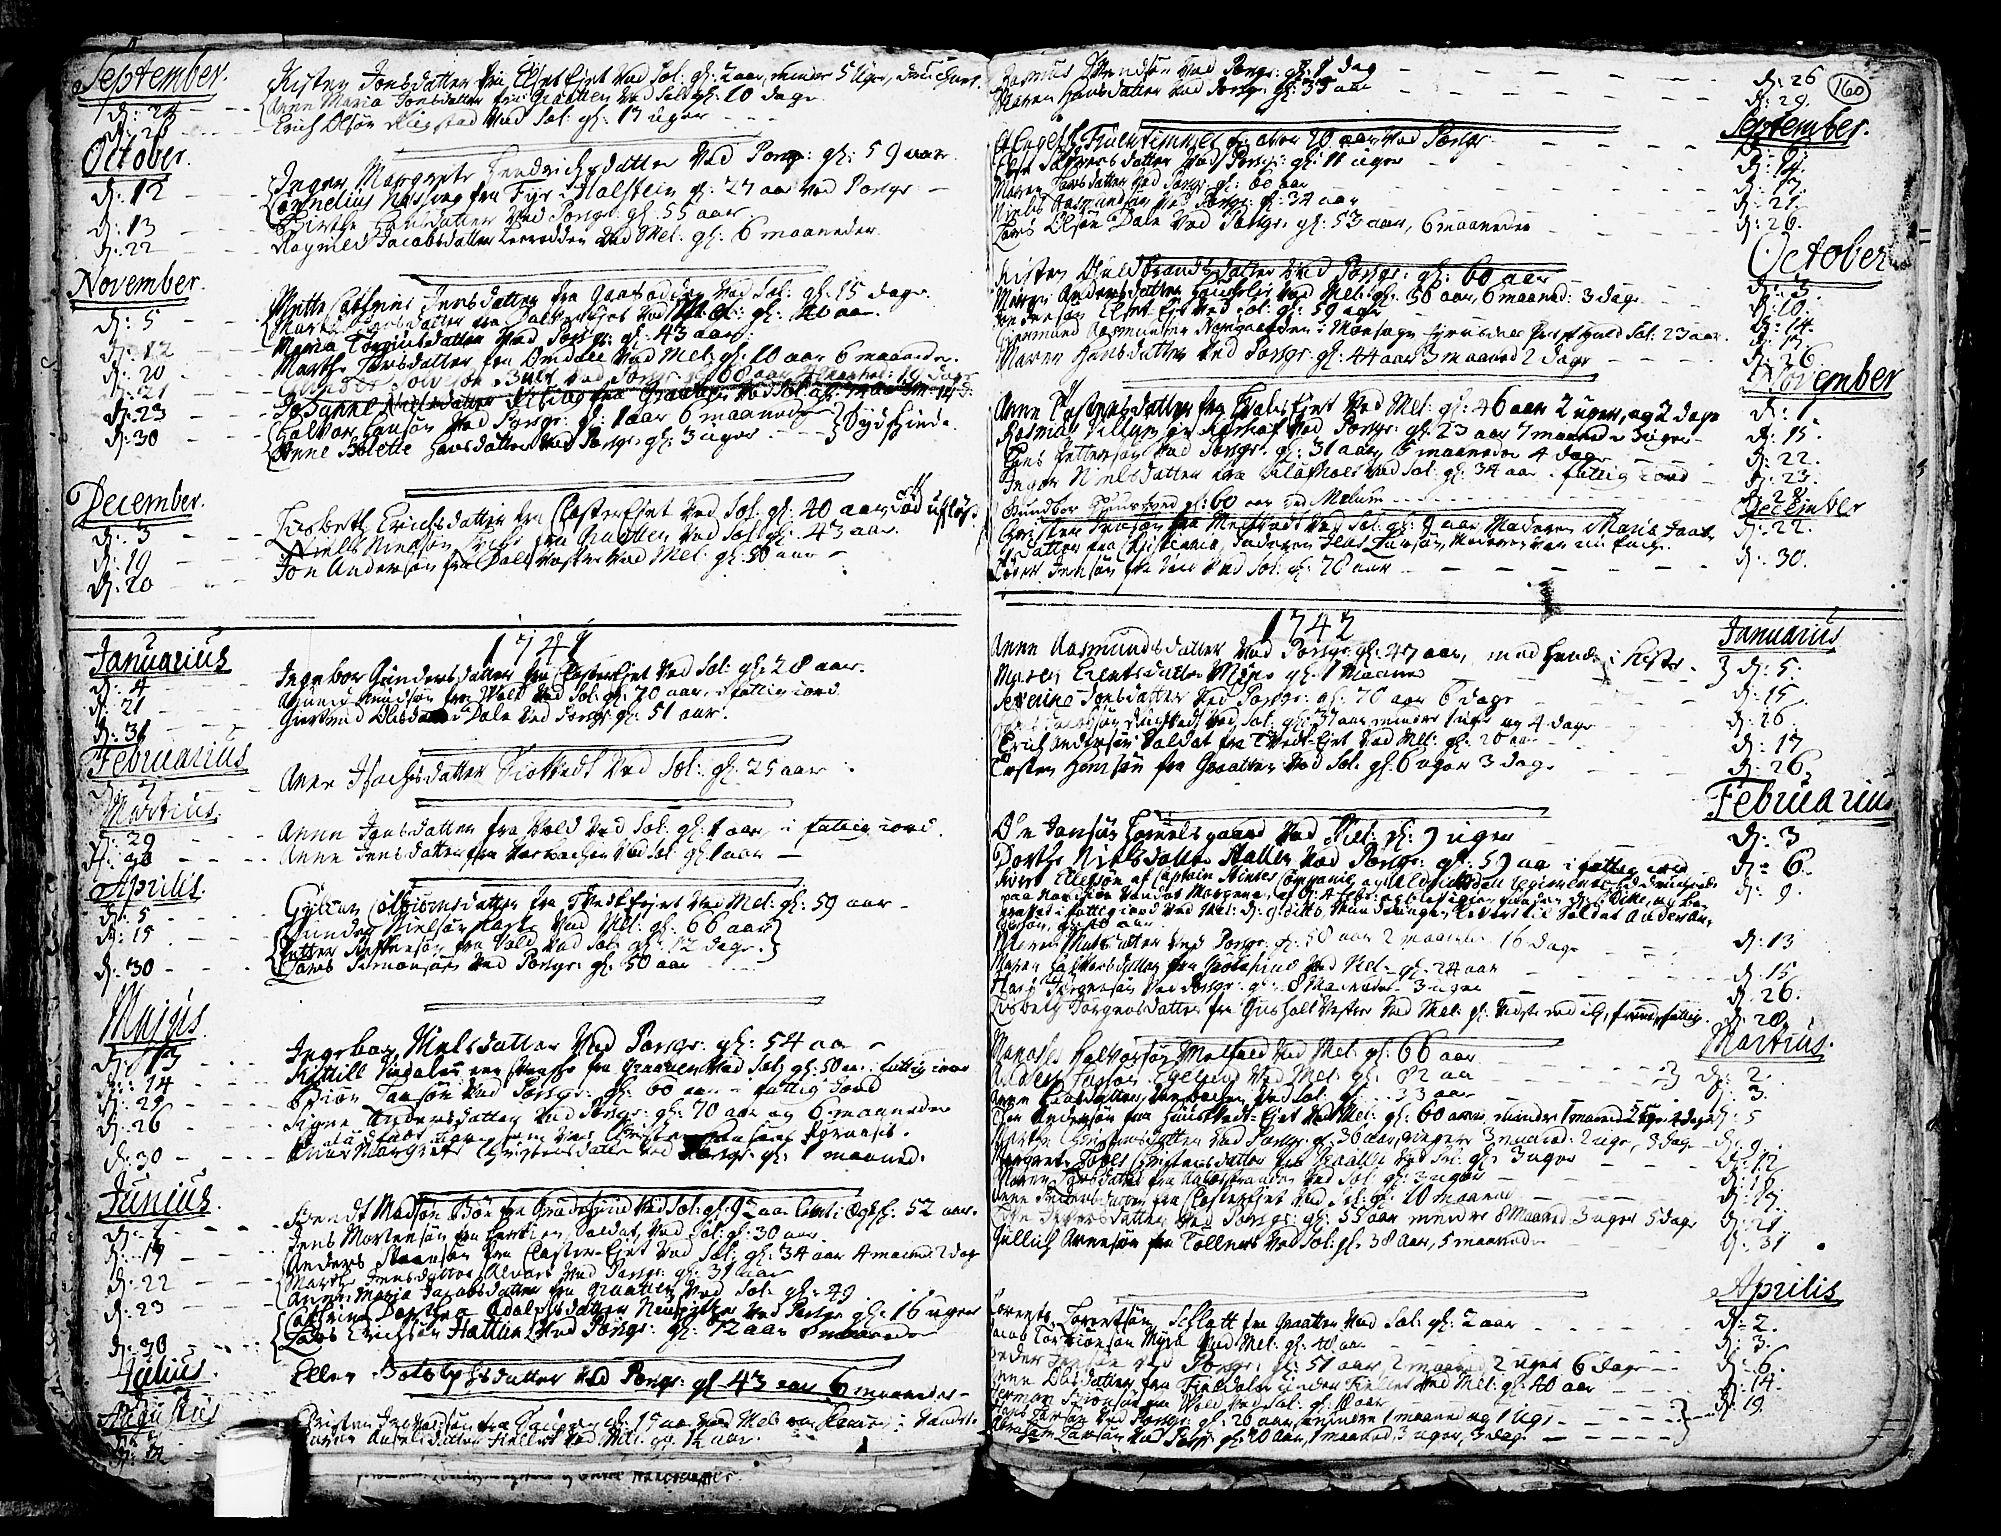 SAKO, Solum kirkebøker, F/Fa/L0002: Ministerialbok nr. I 2, 1713-1761, s. 160